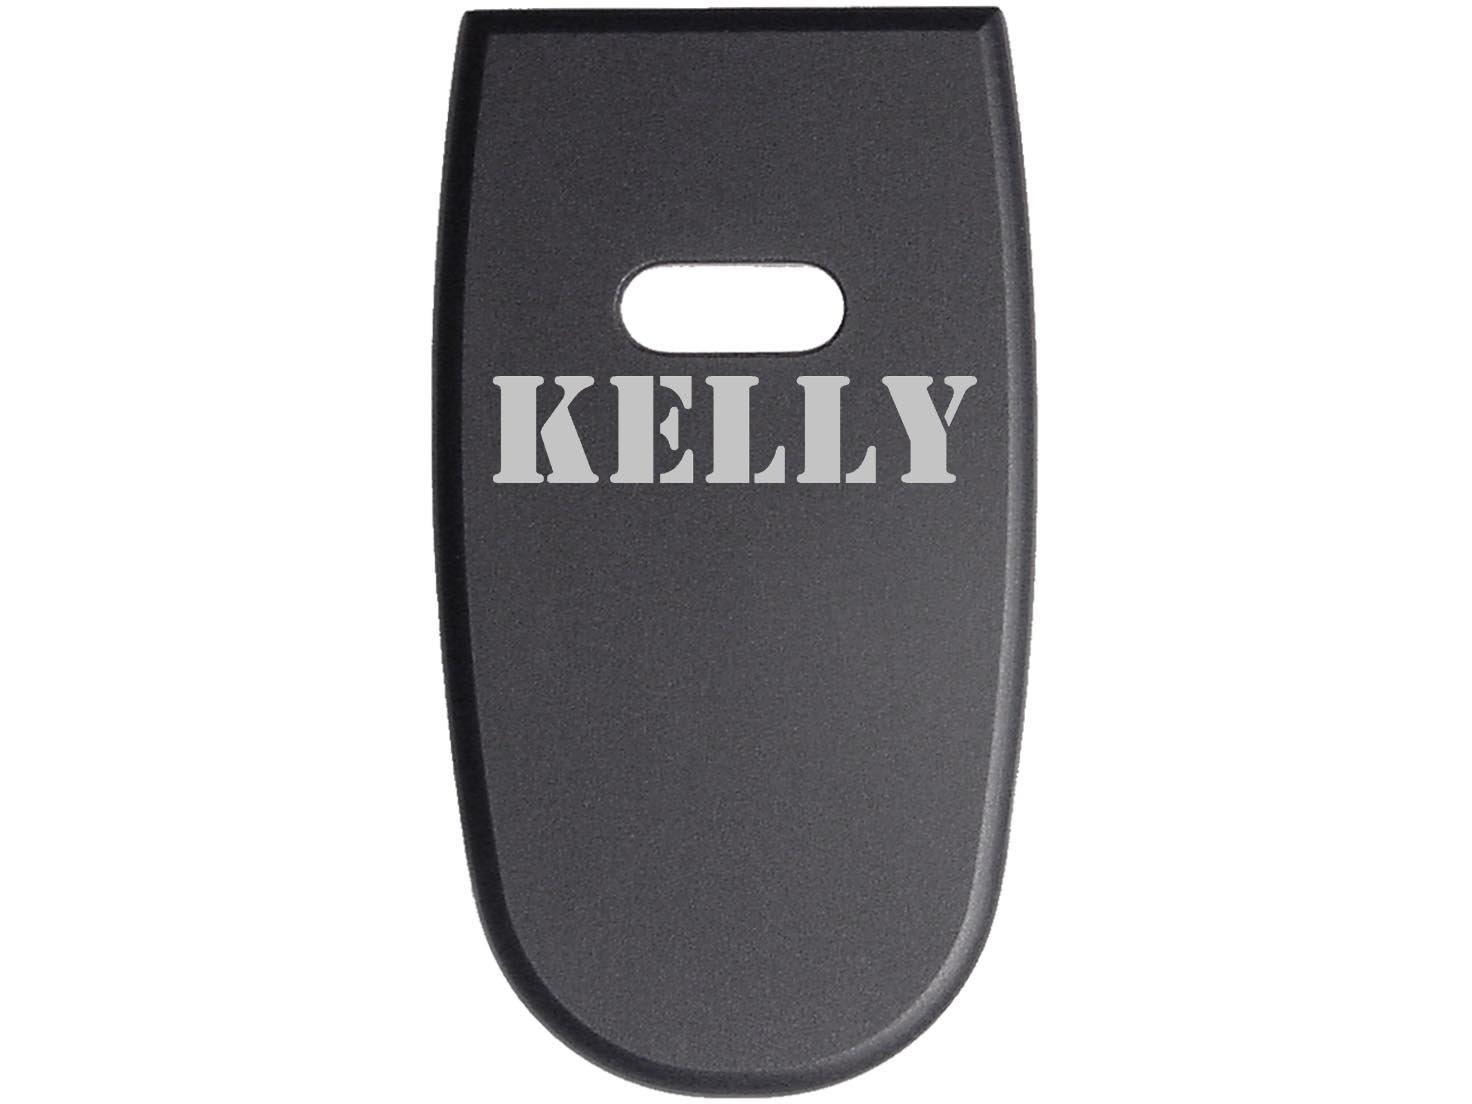 for S&W M&P Shield .45 Aluminum Floor Base Plate Black Custom Laser Engraved: Name Kelly By NDZ Performance